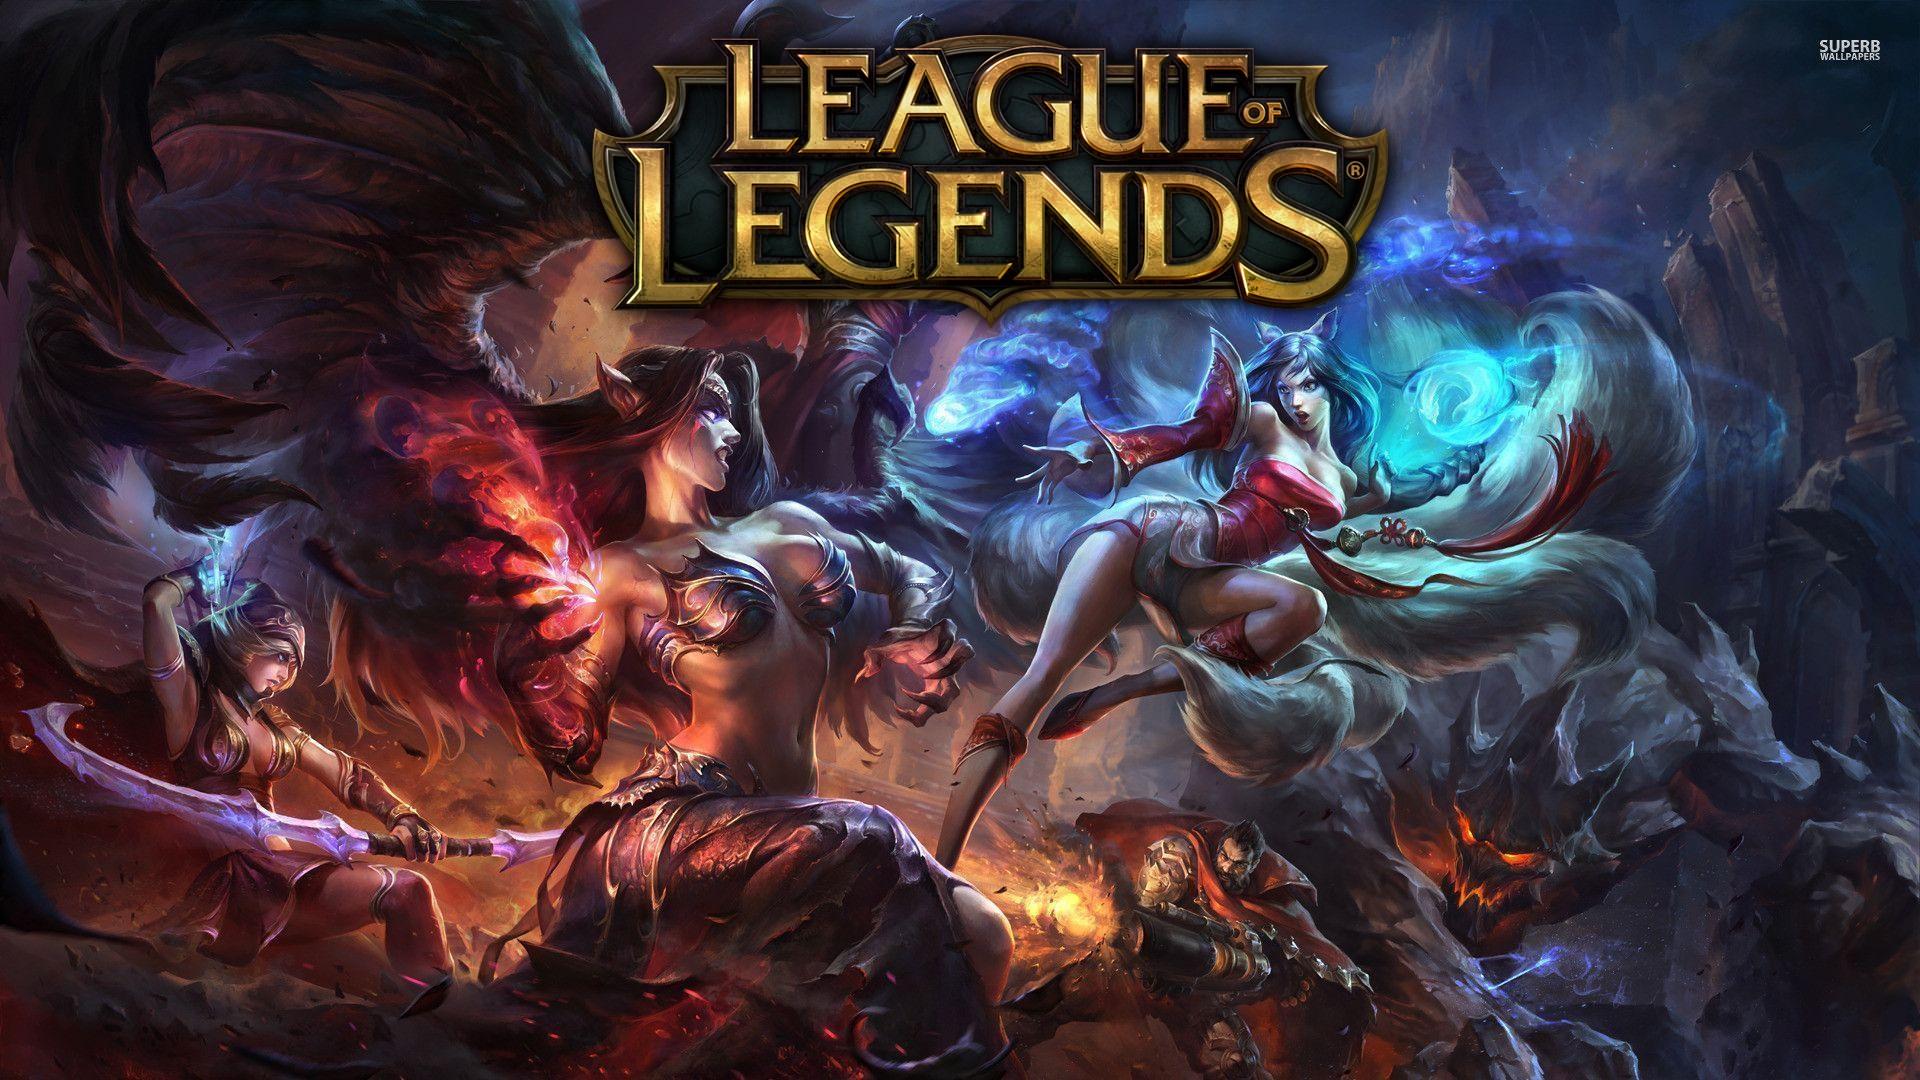 Jogue League of Legends: faça download gratuito